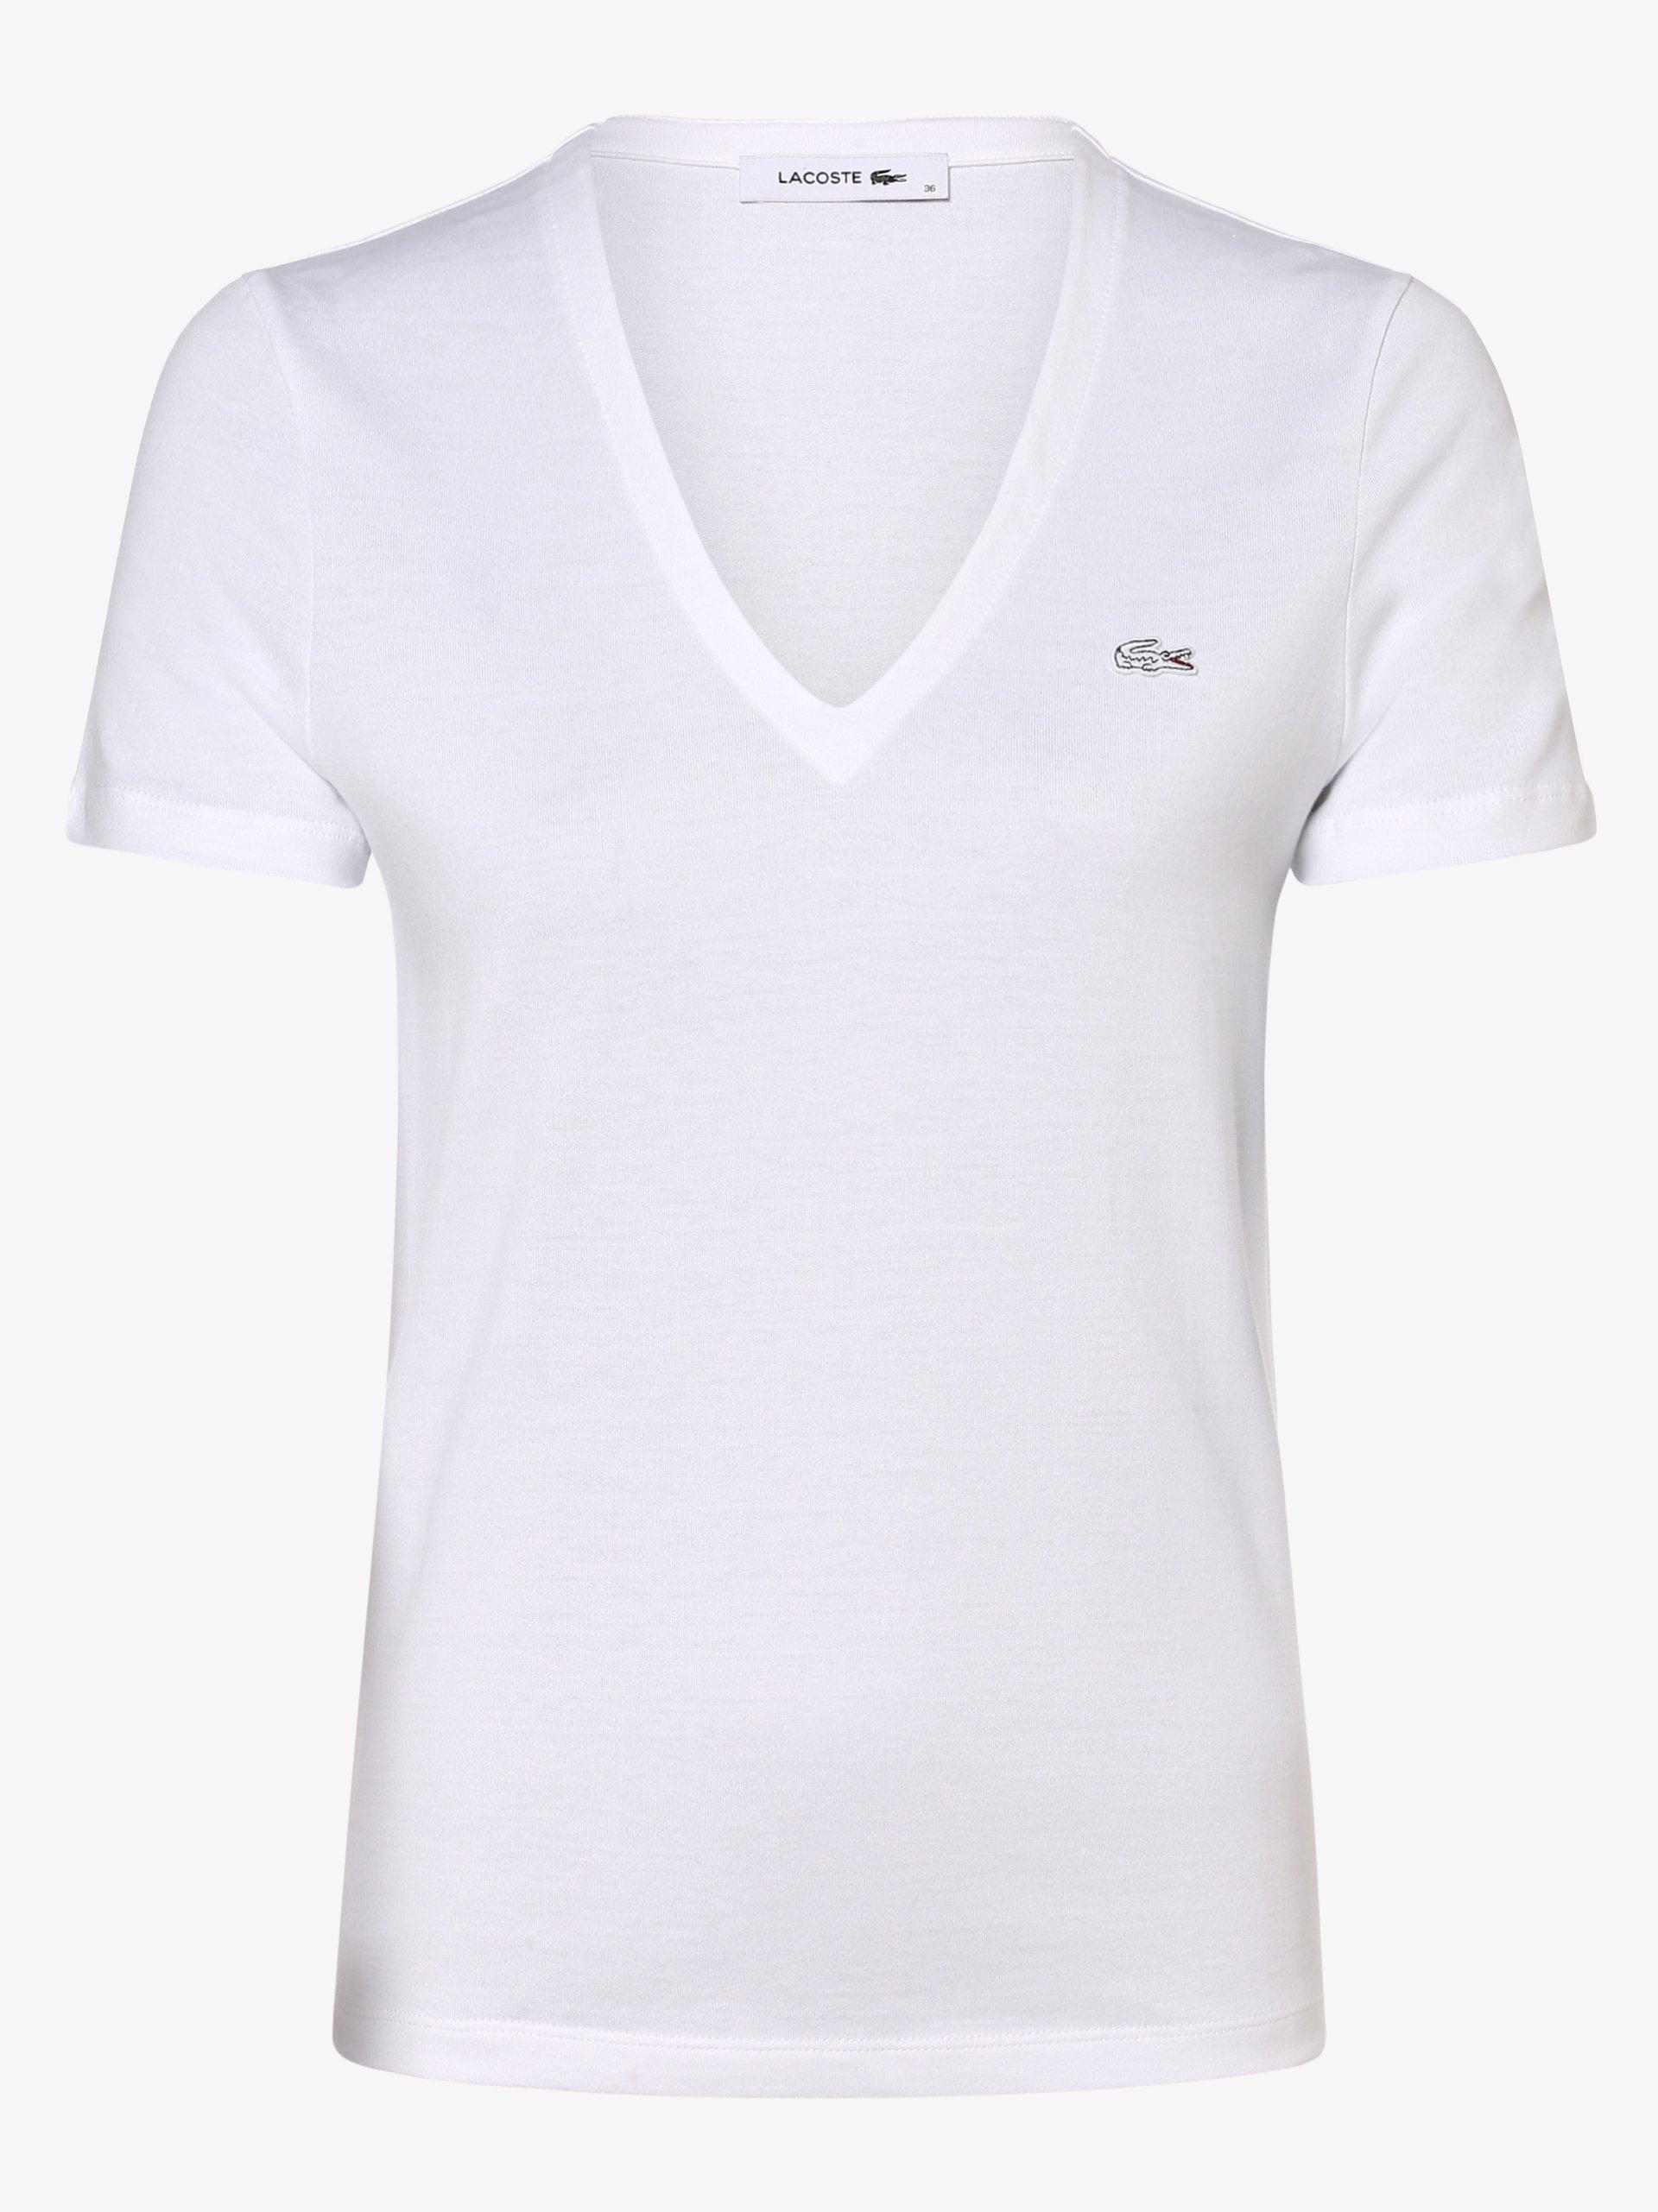 Lacoste Damen T-Shirt